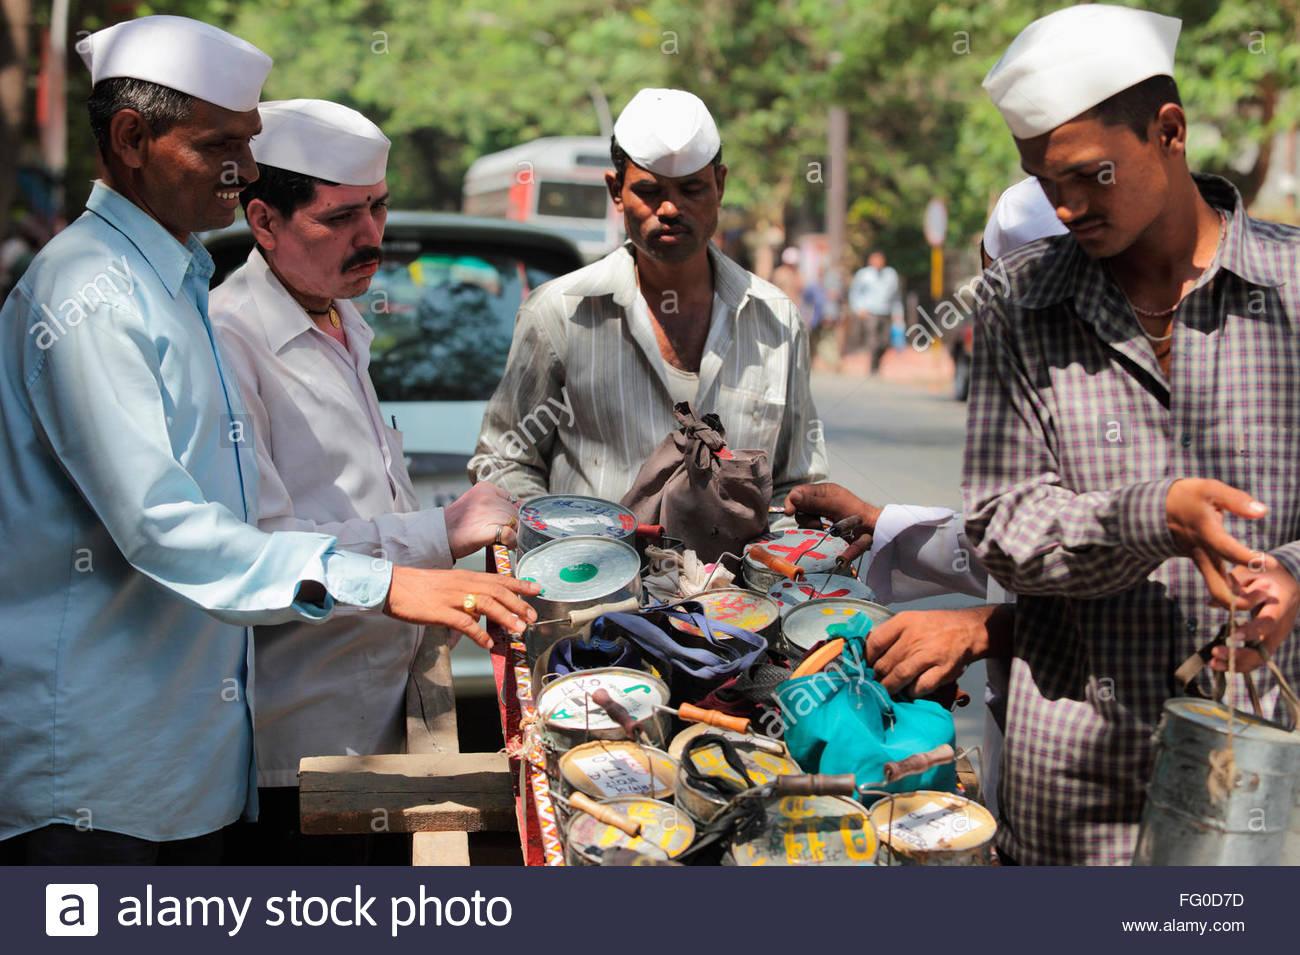 Indian dabbawala dabbawalla tiffin carrier at work of providing lunch boxes ; Bombay Mumbai ; Maharashtra ; India MR#748R  sc 1 st  Alamy & Indian dabbawala dabbawalla tiffin carrier at work of providing ... Aboutintivar.Com